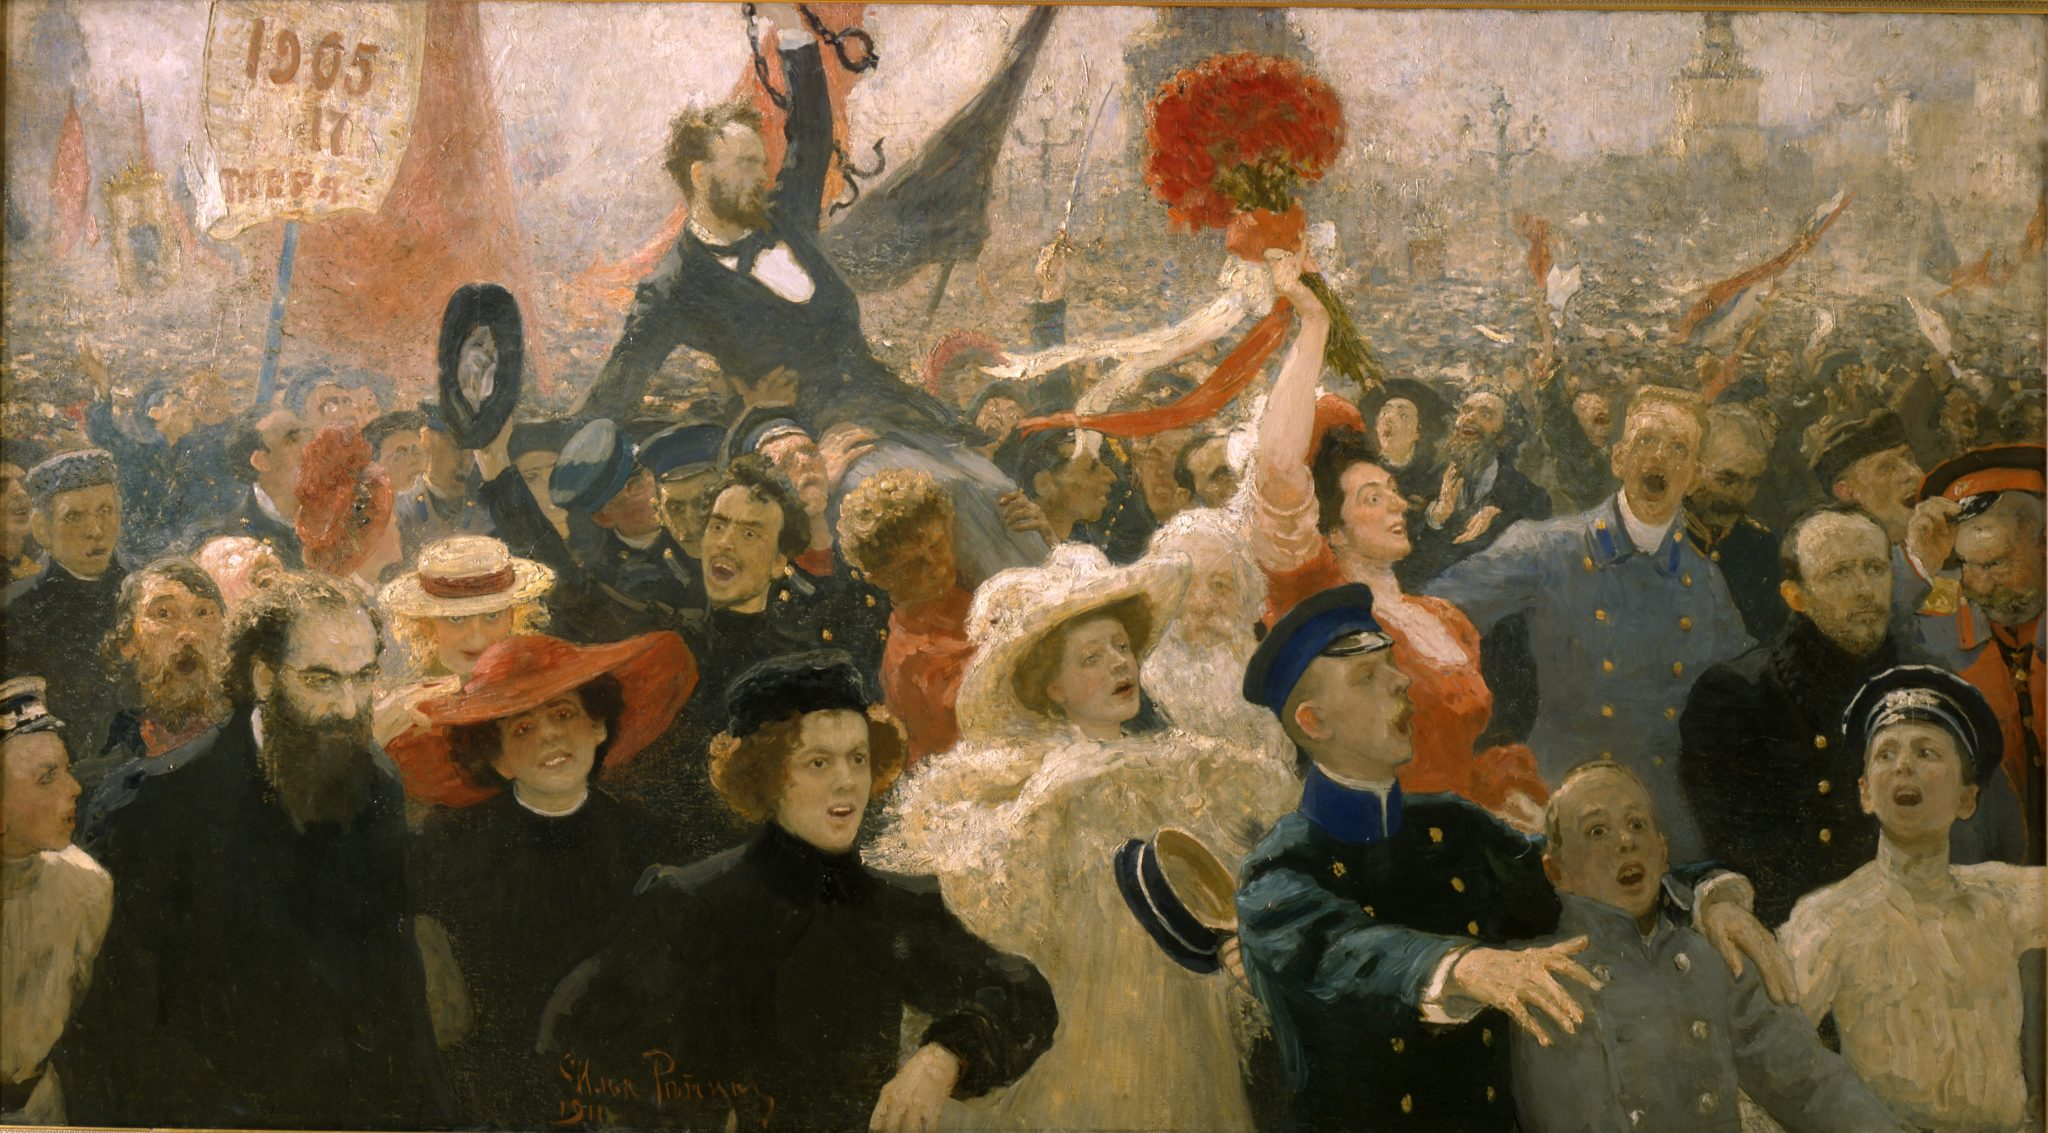 . Il'ja Repin, 17 ottobre 1905, 1907 Olio su tela, 184 x 323 cm ©State Russian Museum, St. Petersburg